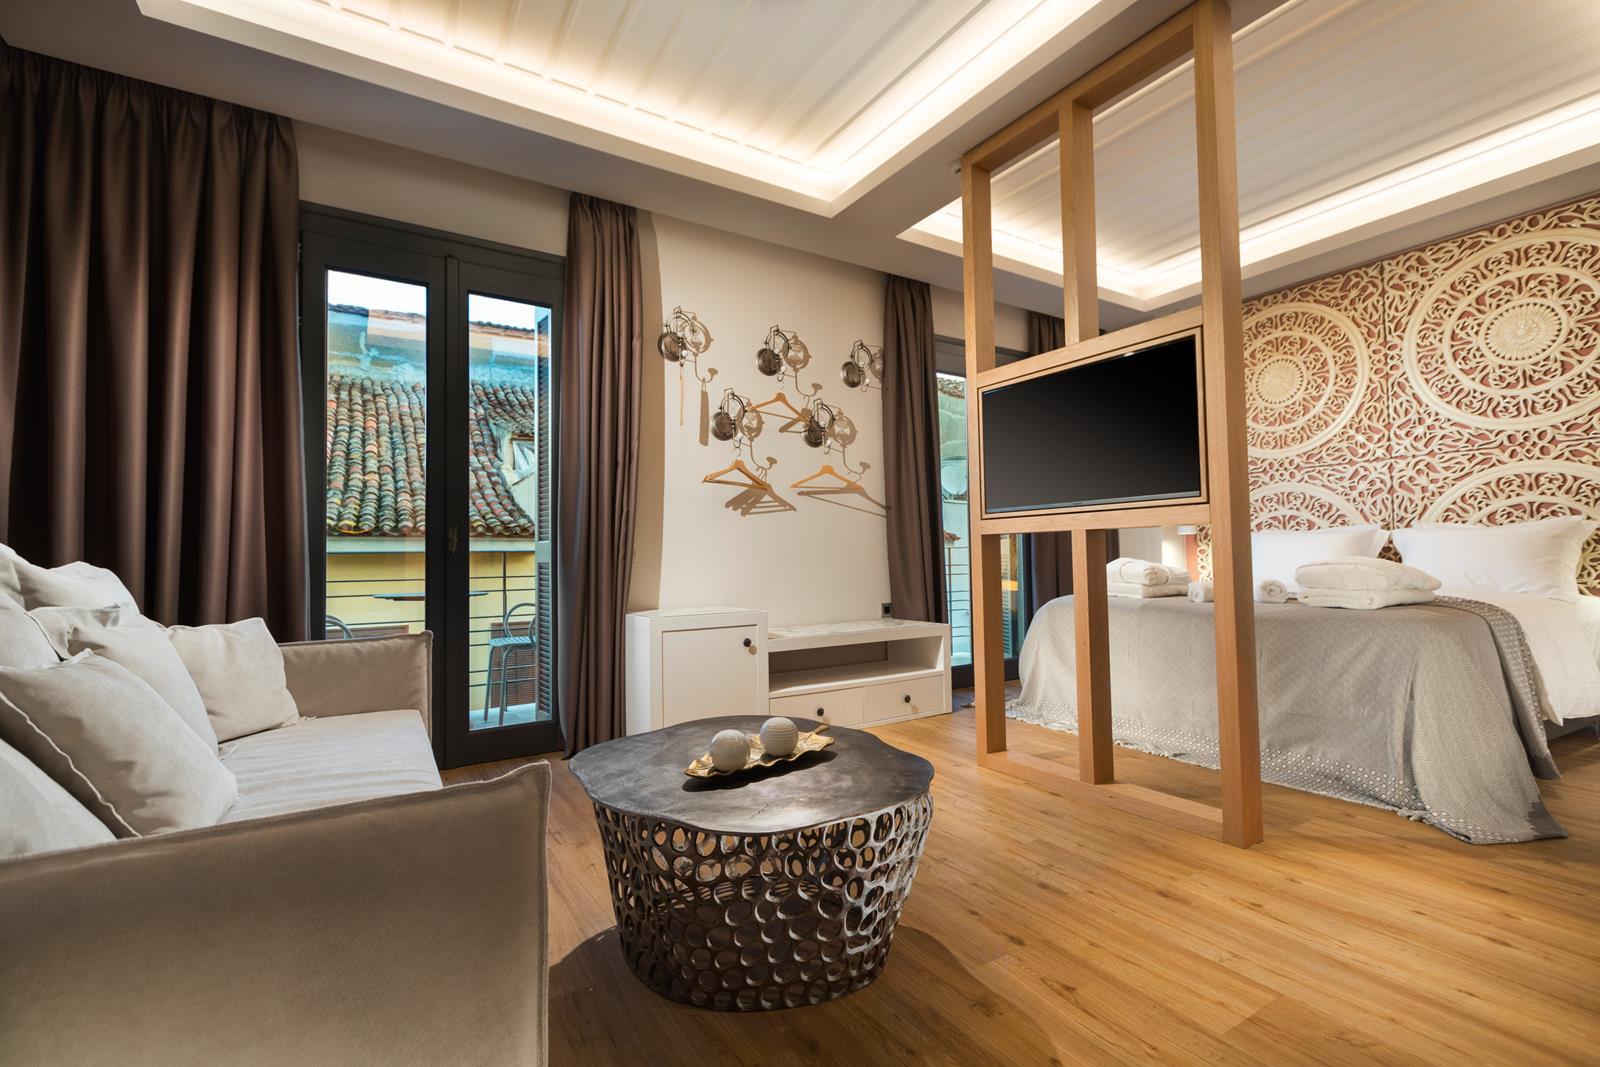 hotel in nafplio - Carpe Diem Boutique Hotel